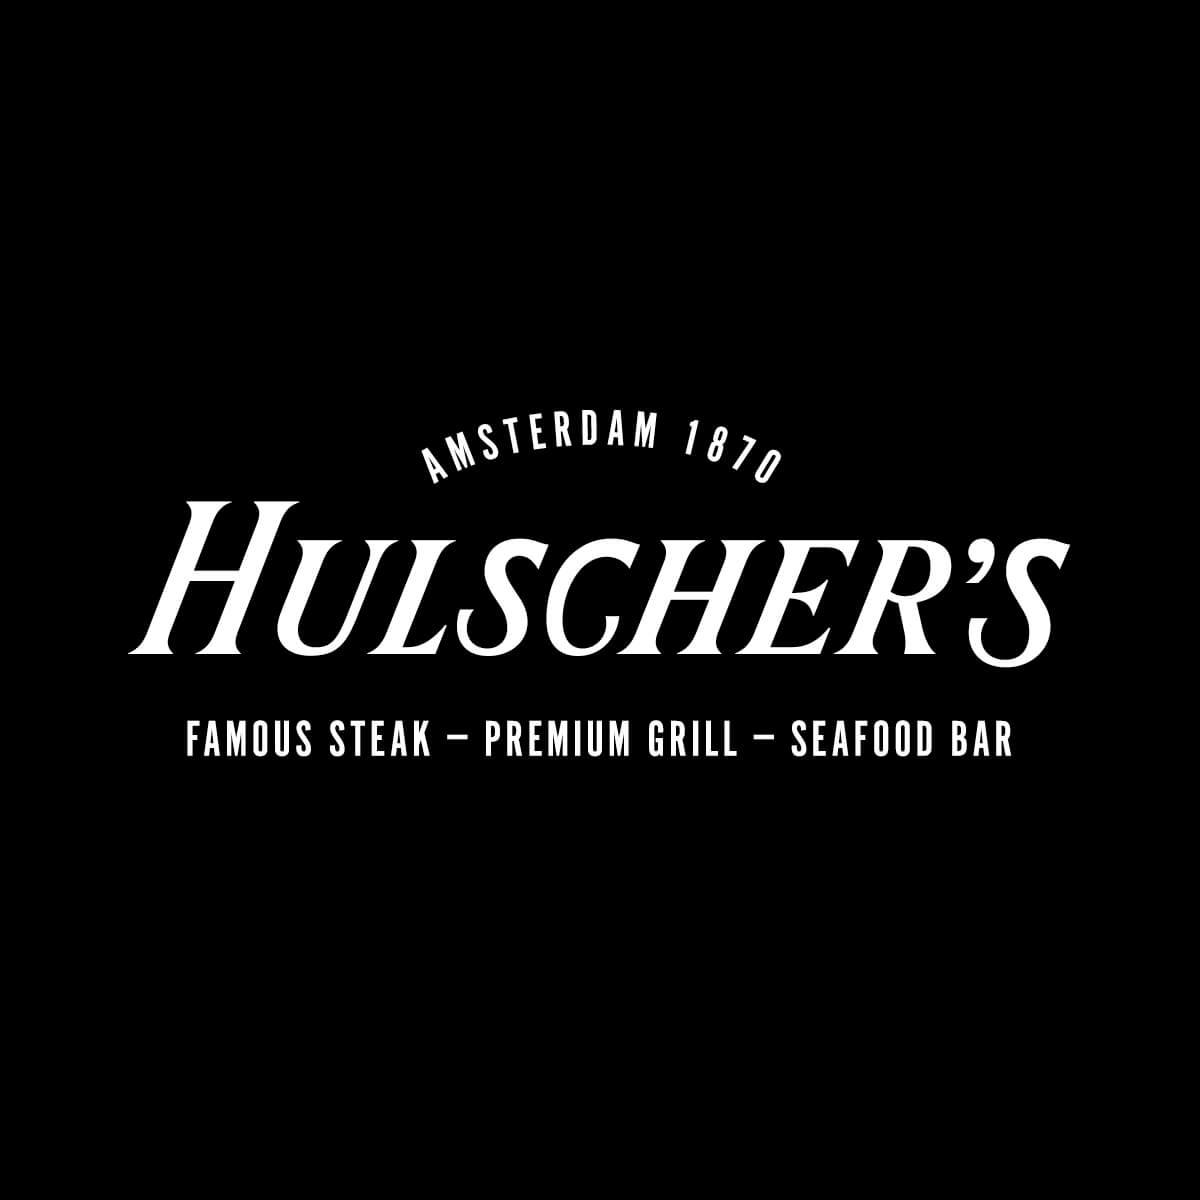 Hulschers